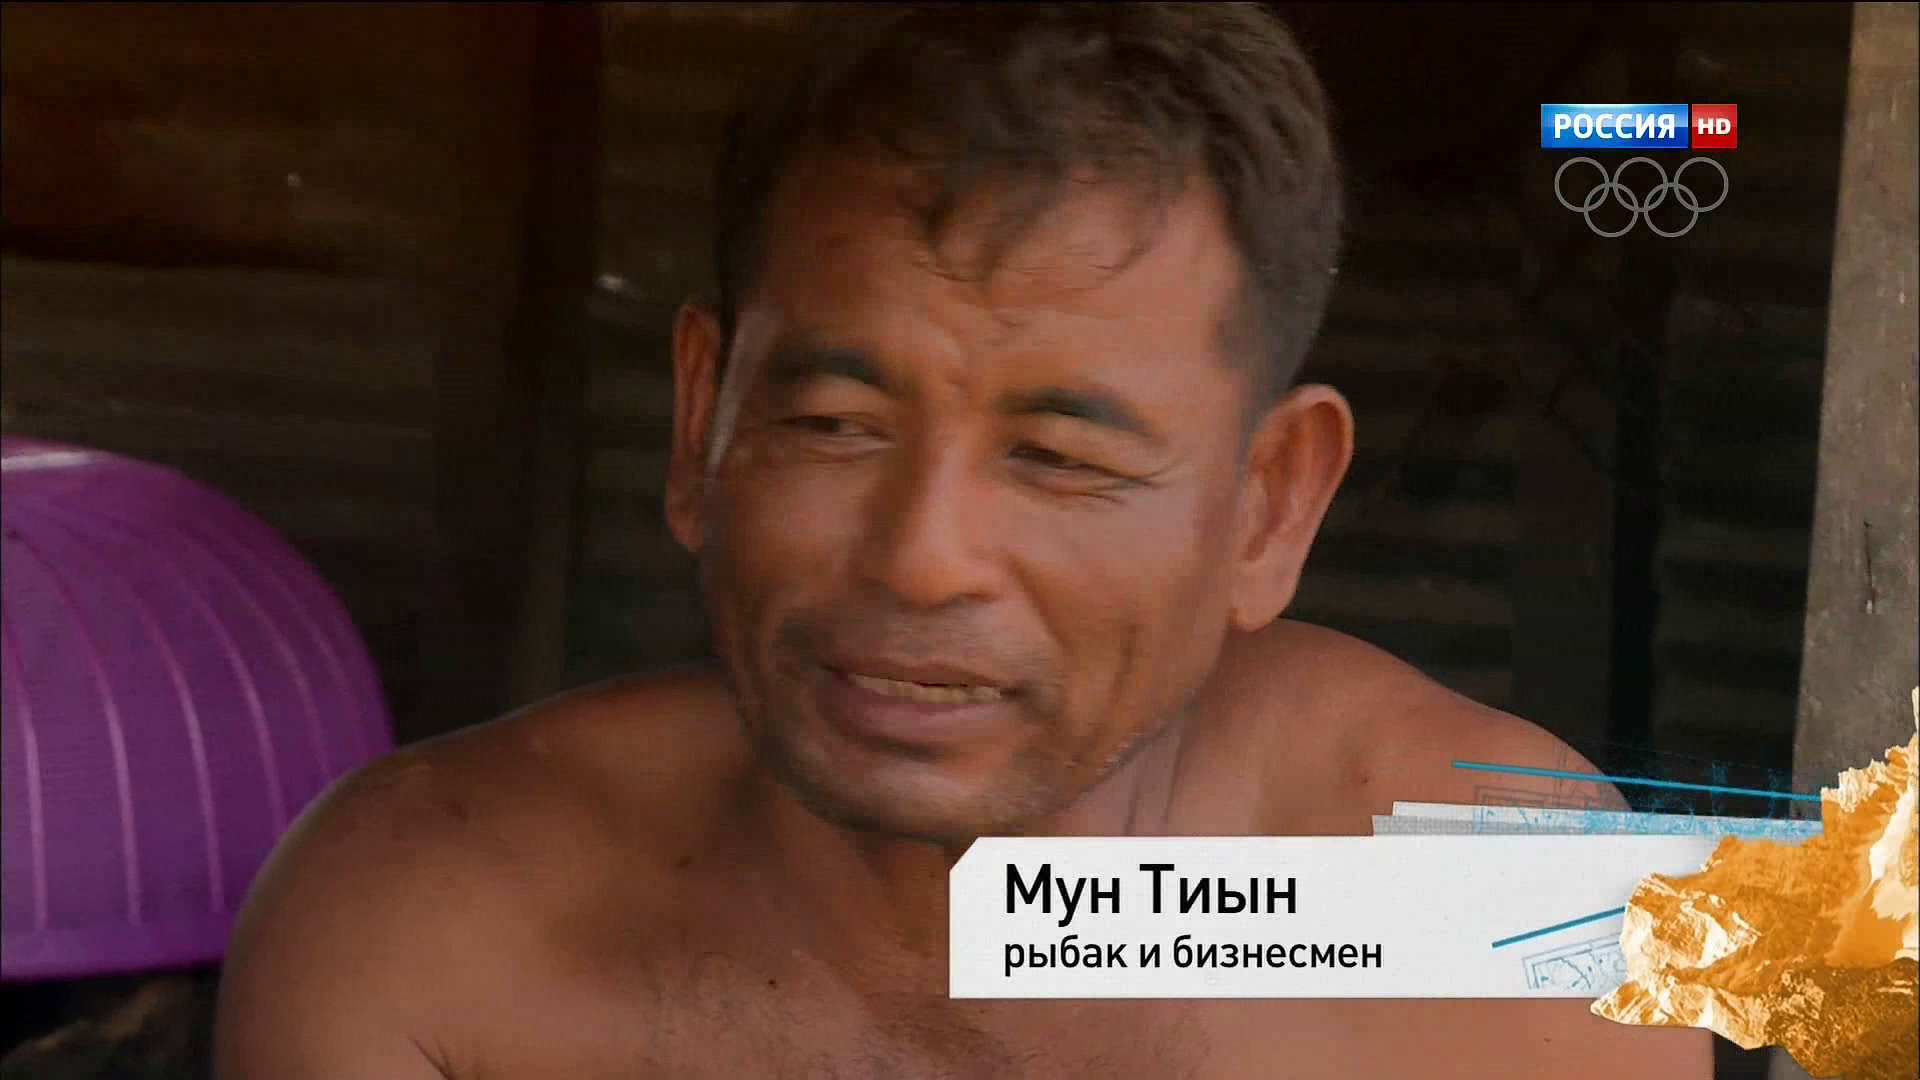 http://i3.imageban.ru/out/2014/01/15/4e4f560d3b2a652a046c0bd09ee07fbf.jpg